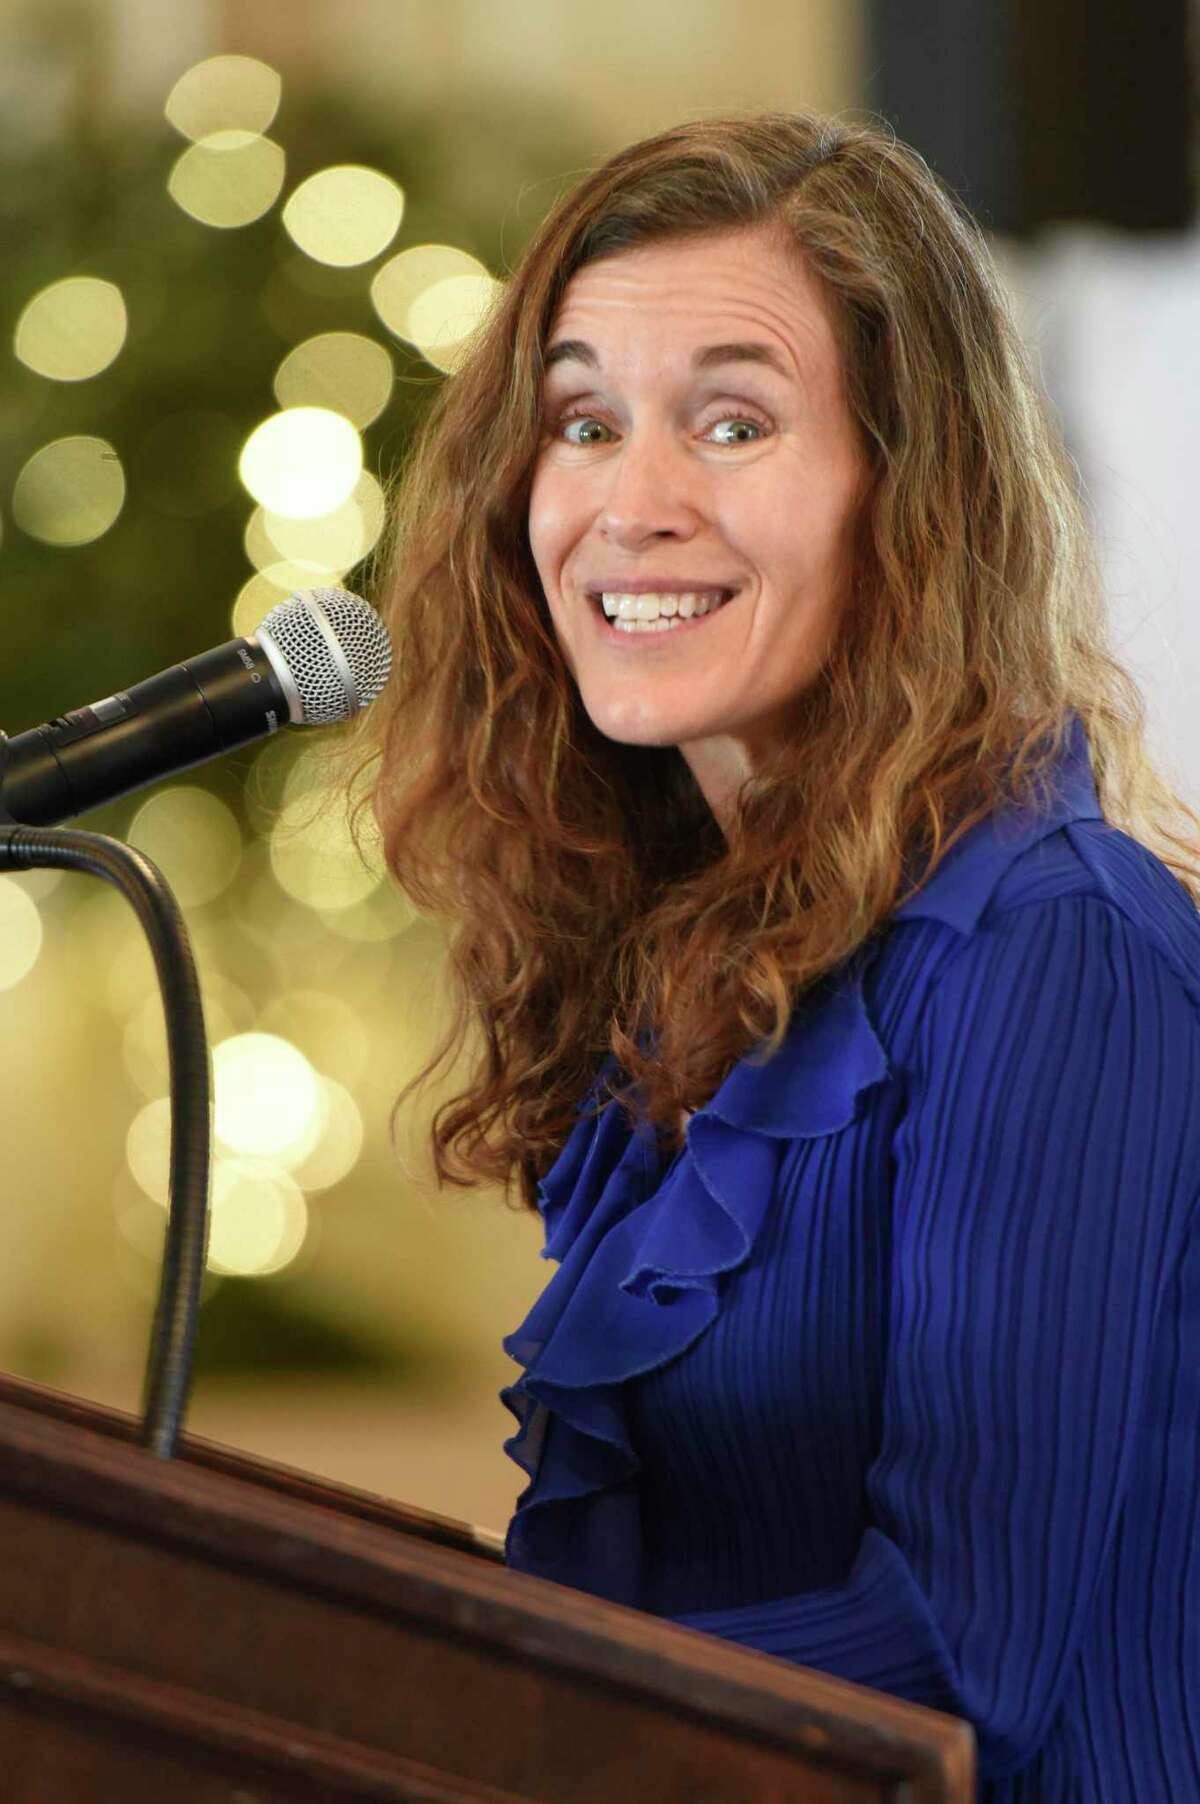 Melissa Bernstein, co-founder of the Westport-based toy company Melissa & Doug.